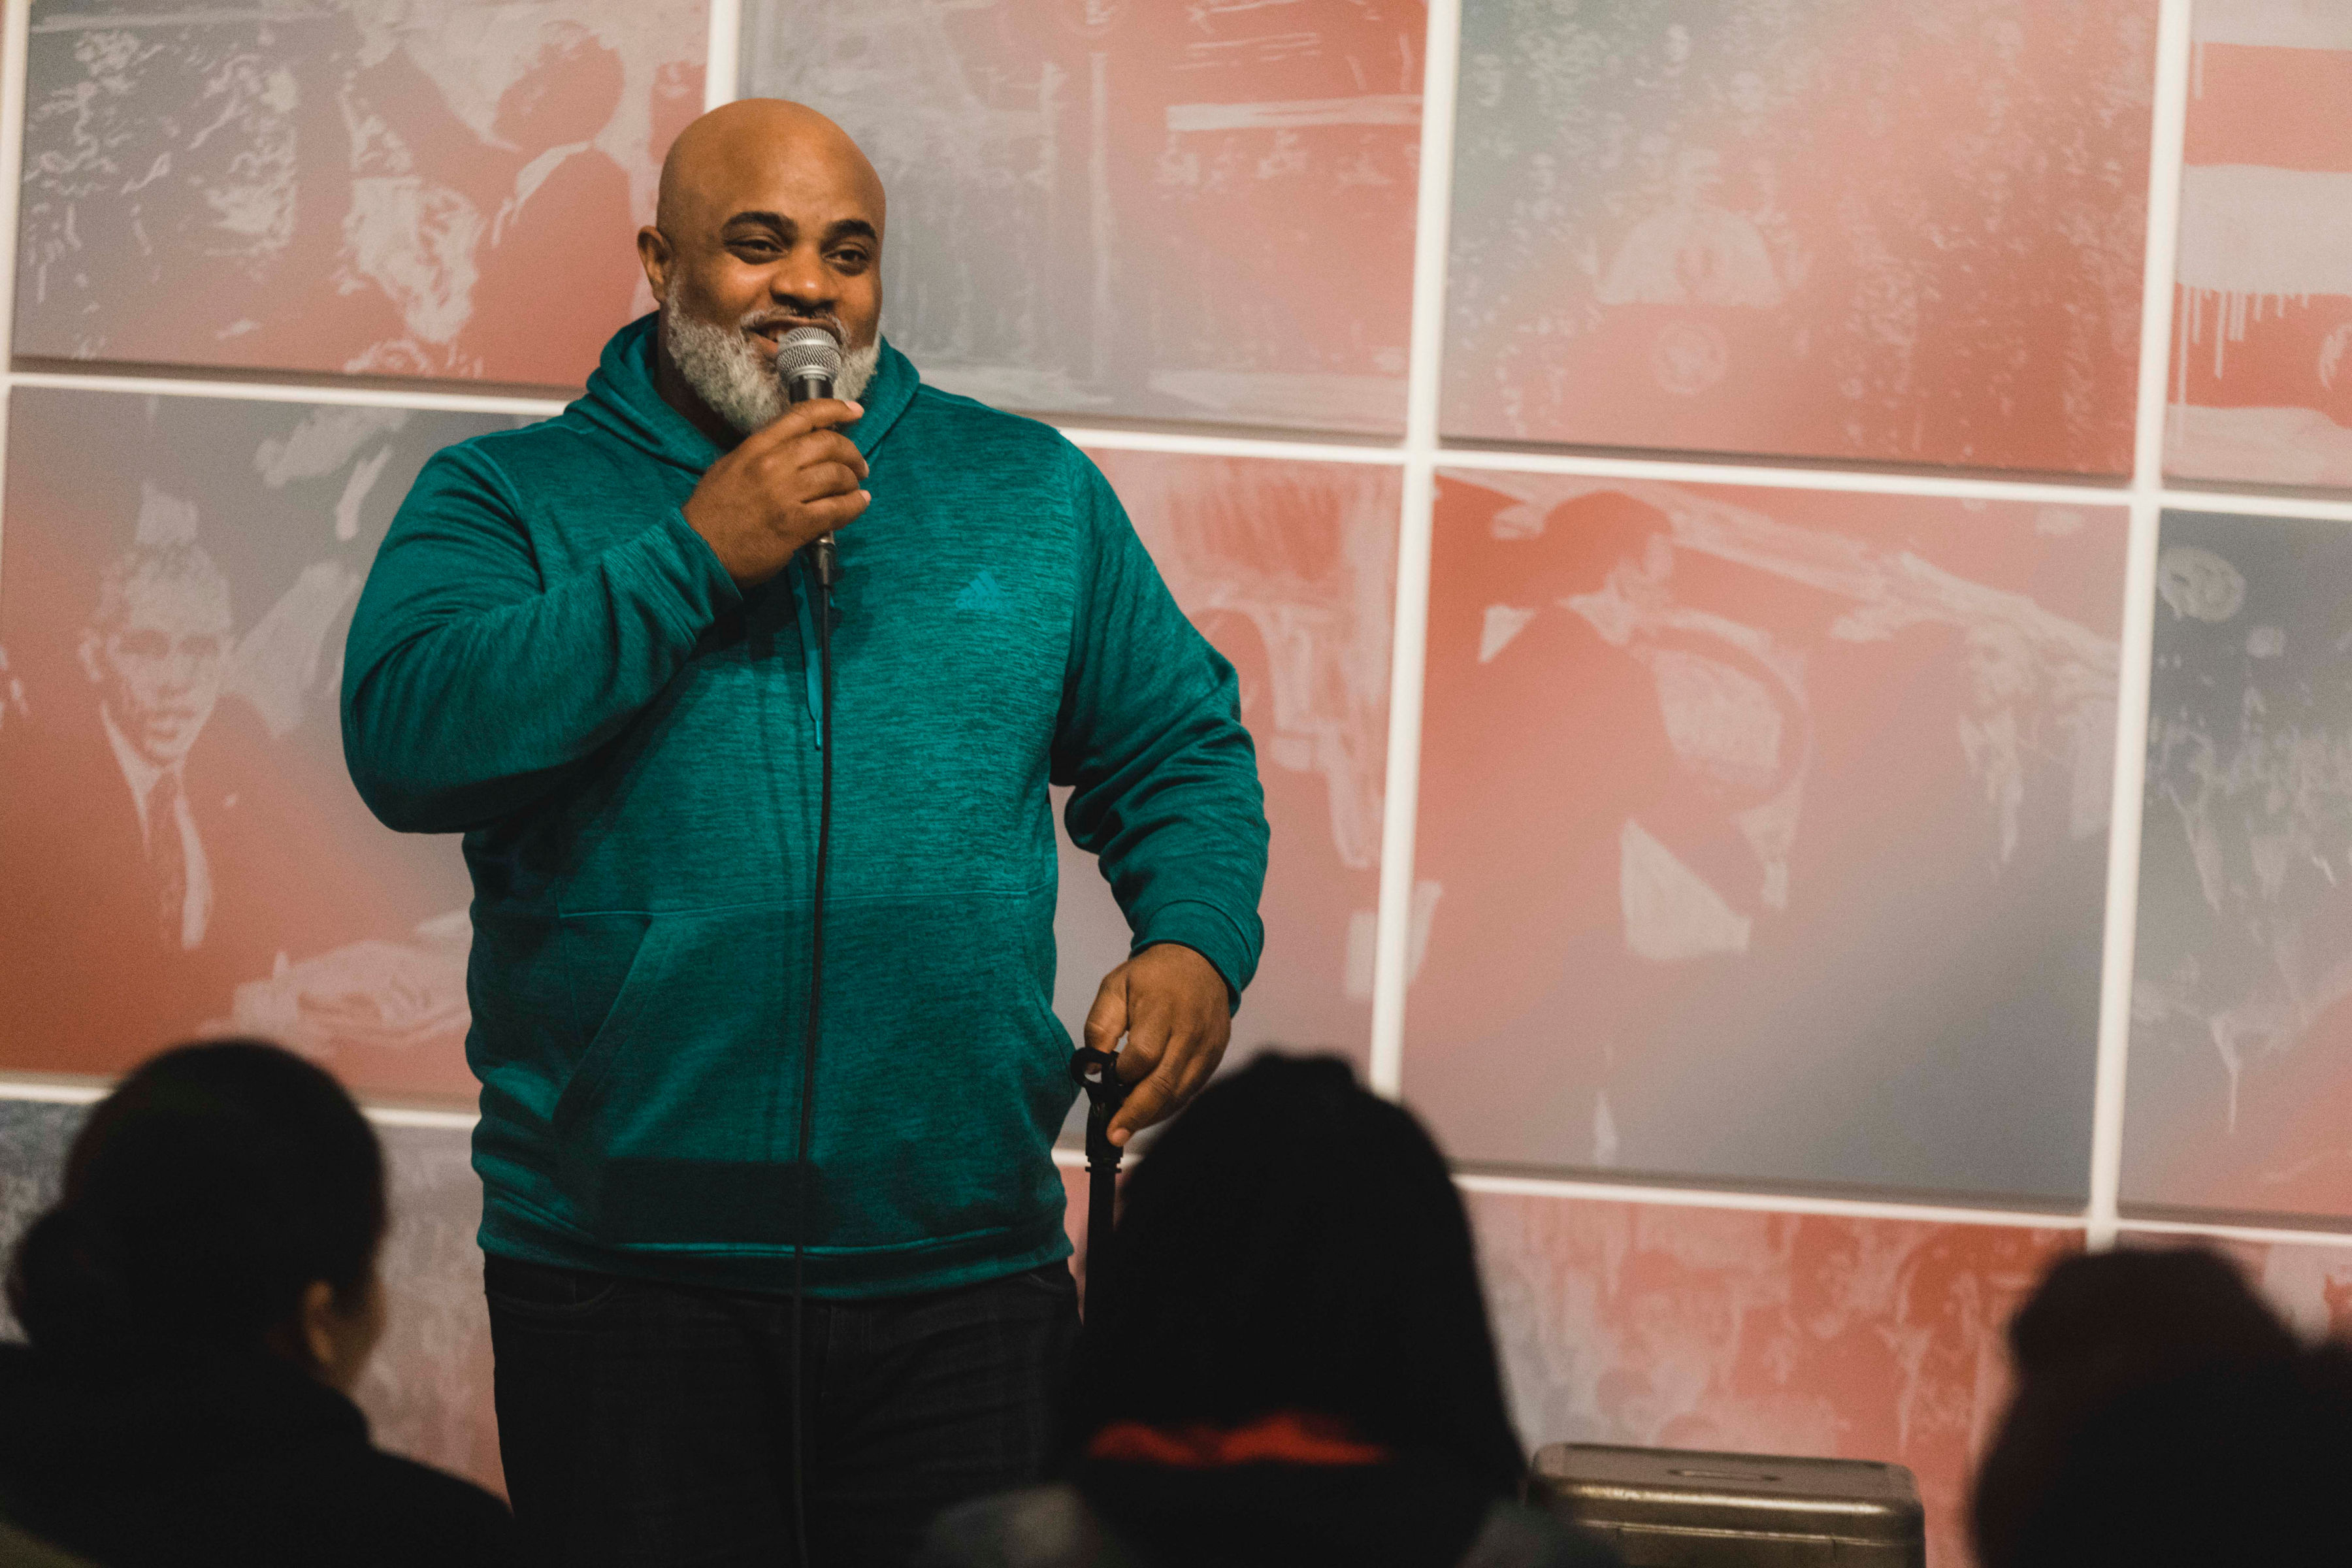 TJ Crawford, founder of Black Culture Week